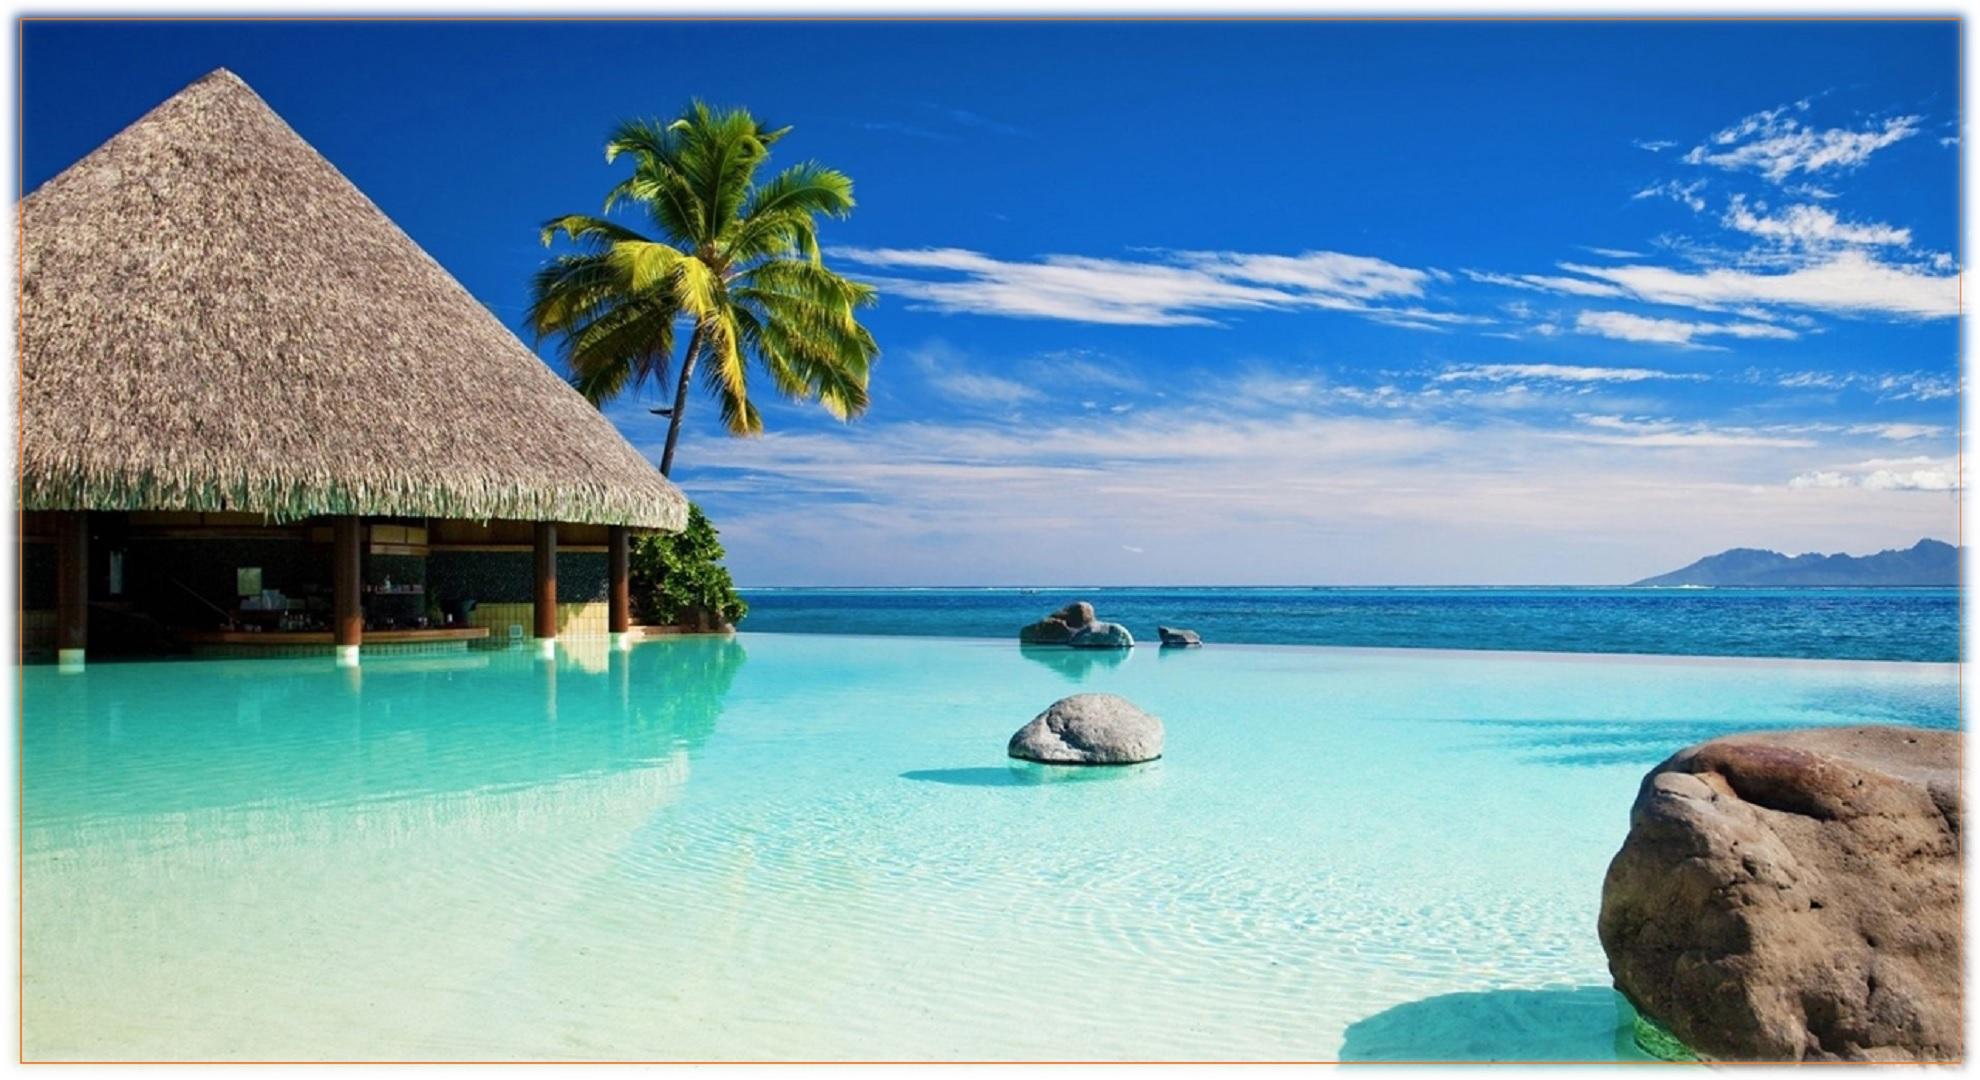 Maldives Trip 3N / 4D